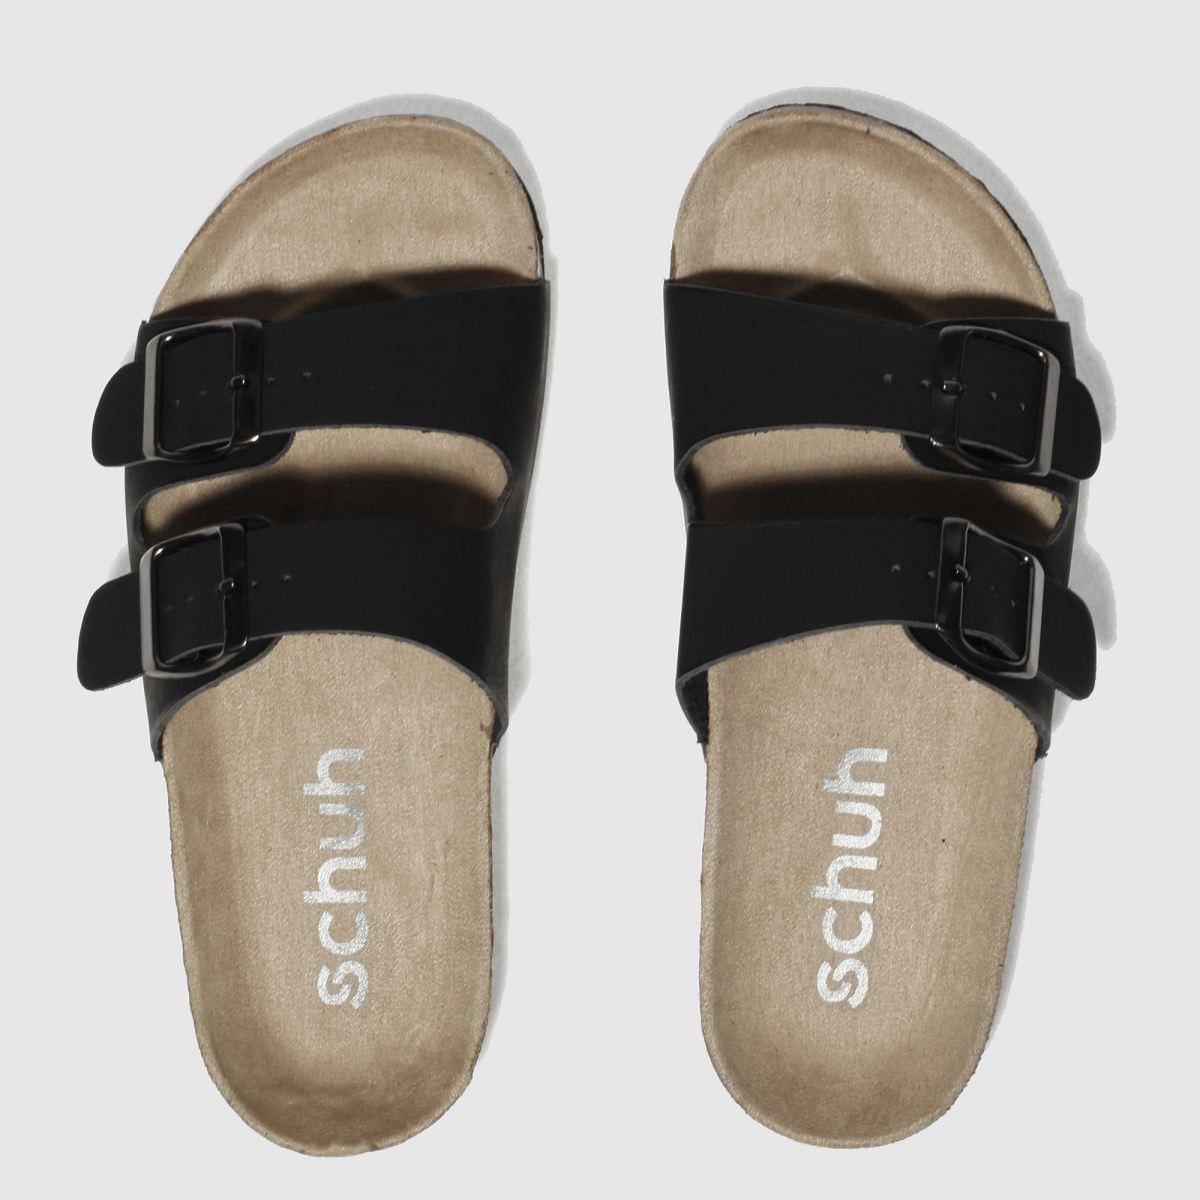 schuh black hawaii sandals